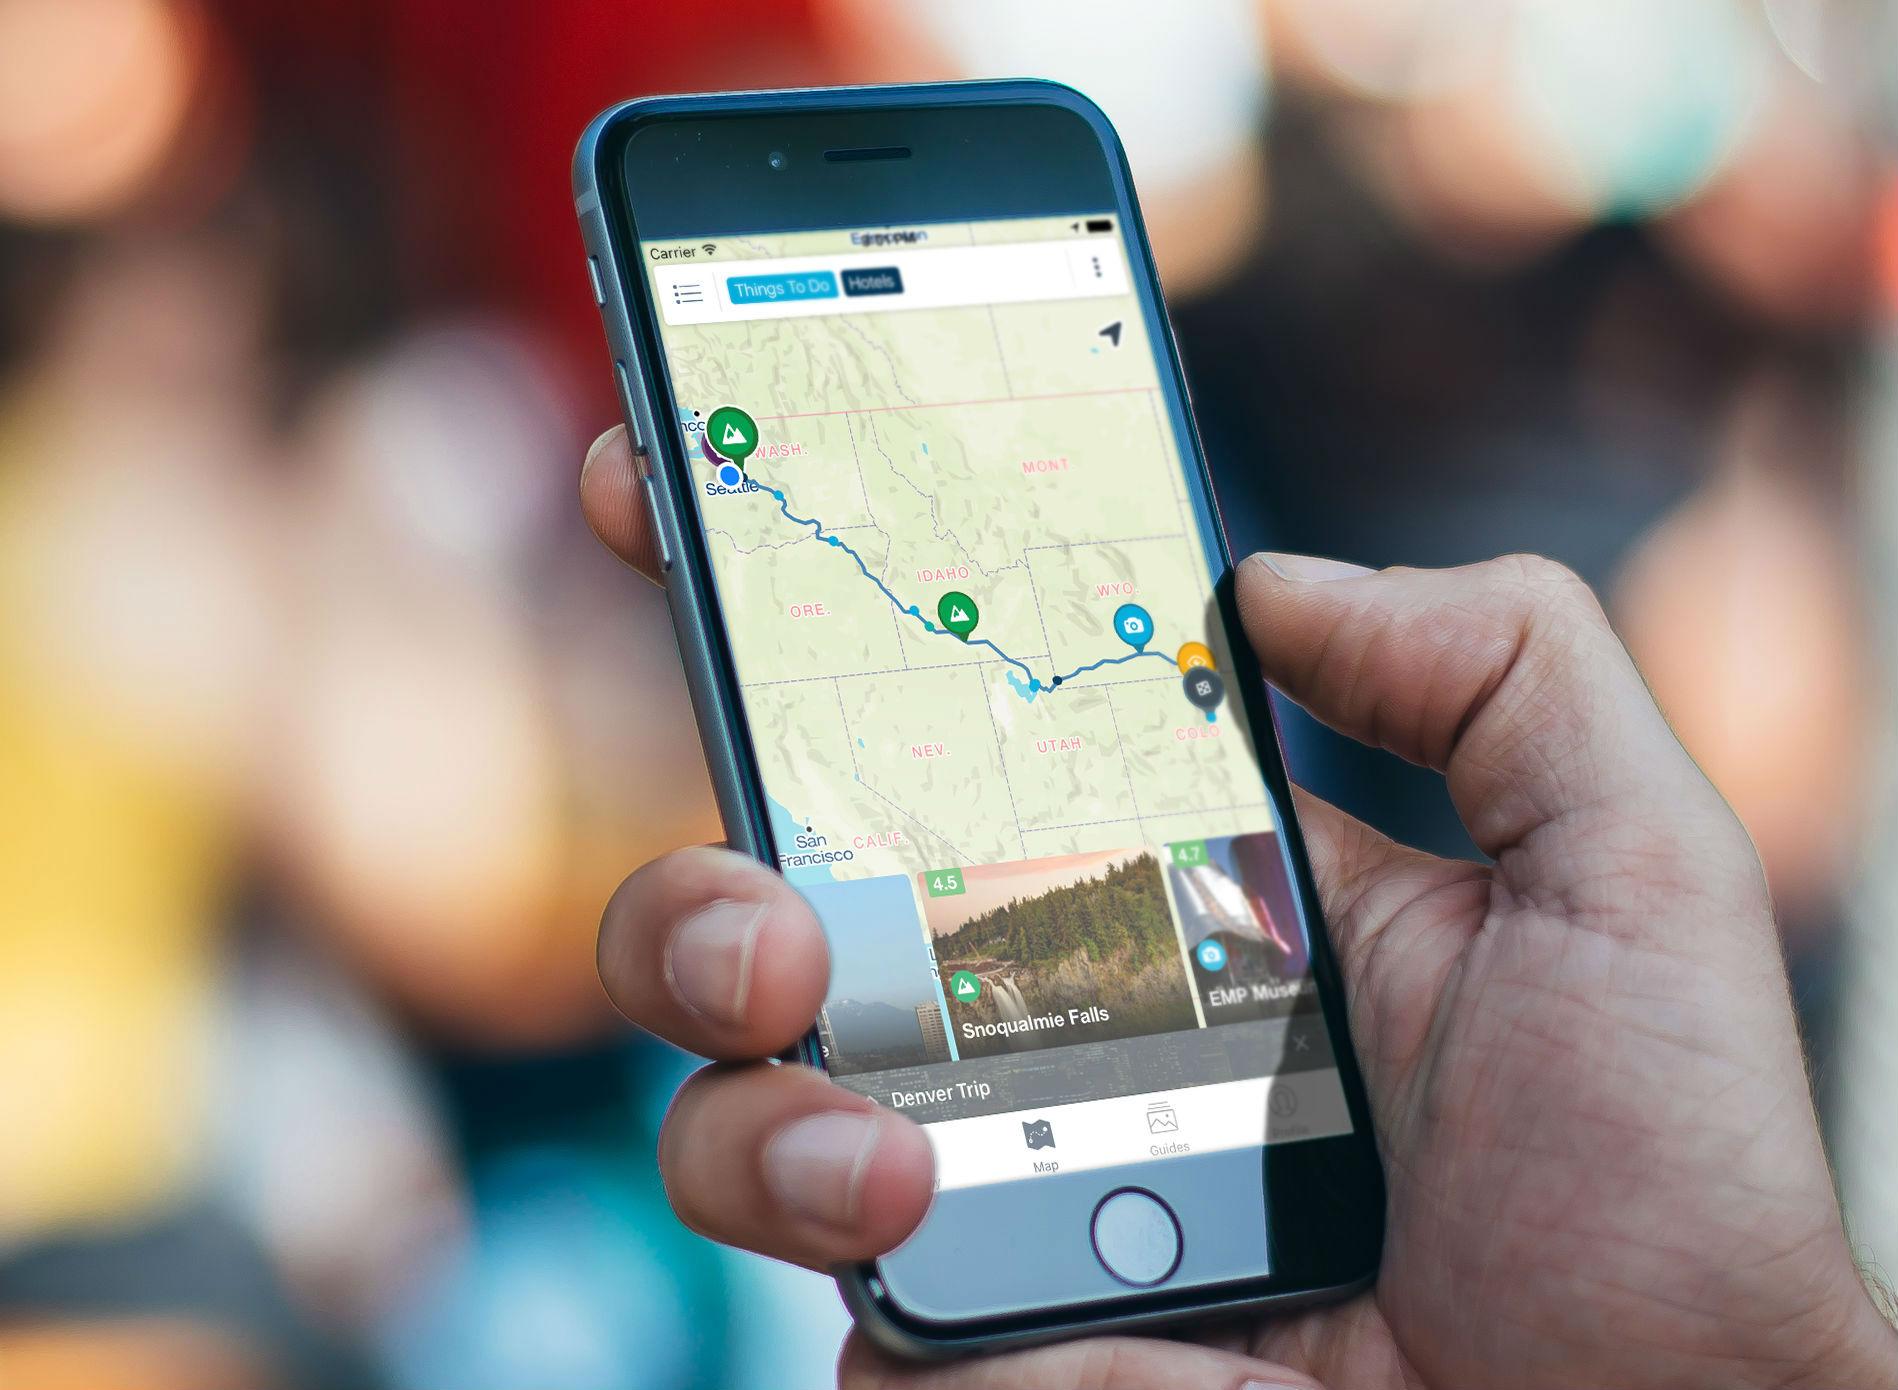 beyond business travel app